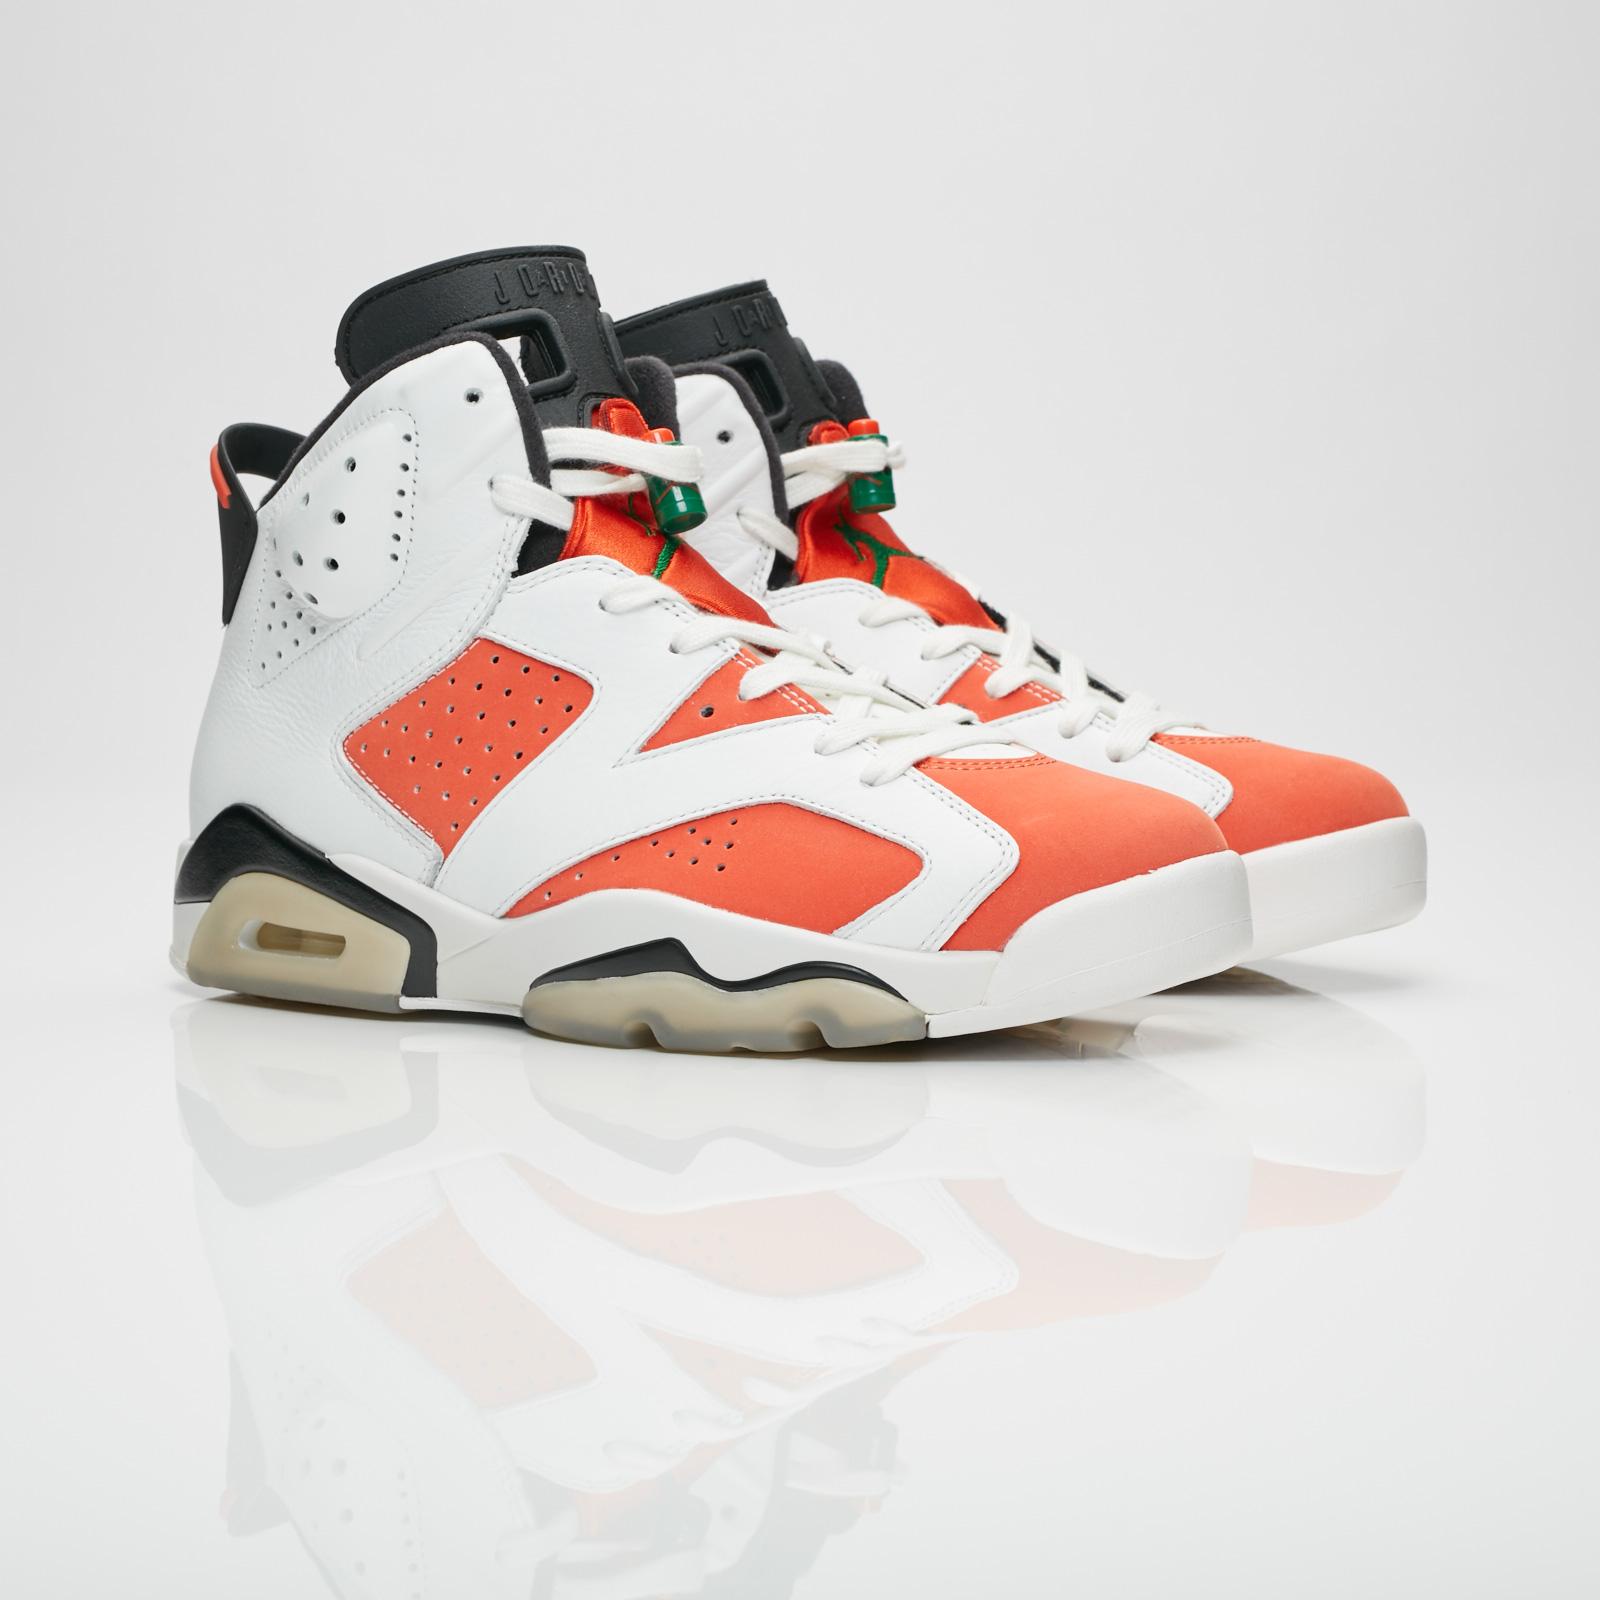 d8603359e245 Jordan Brand Air Jordan 6 Retro Like Mike - 384664-145 ...